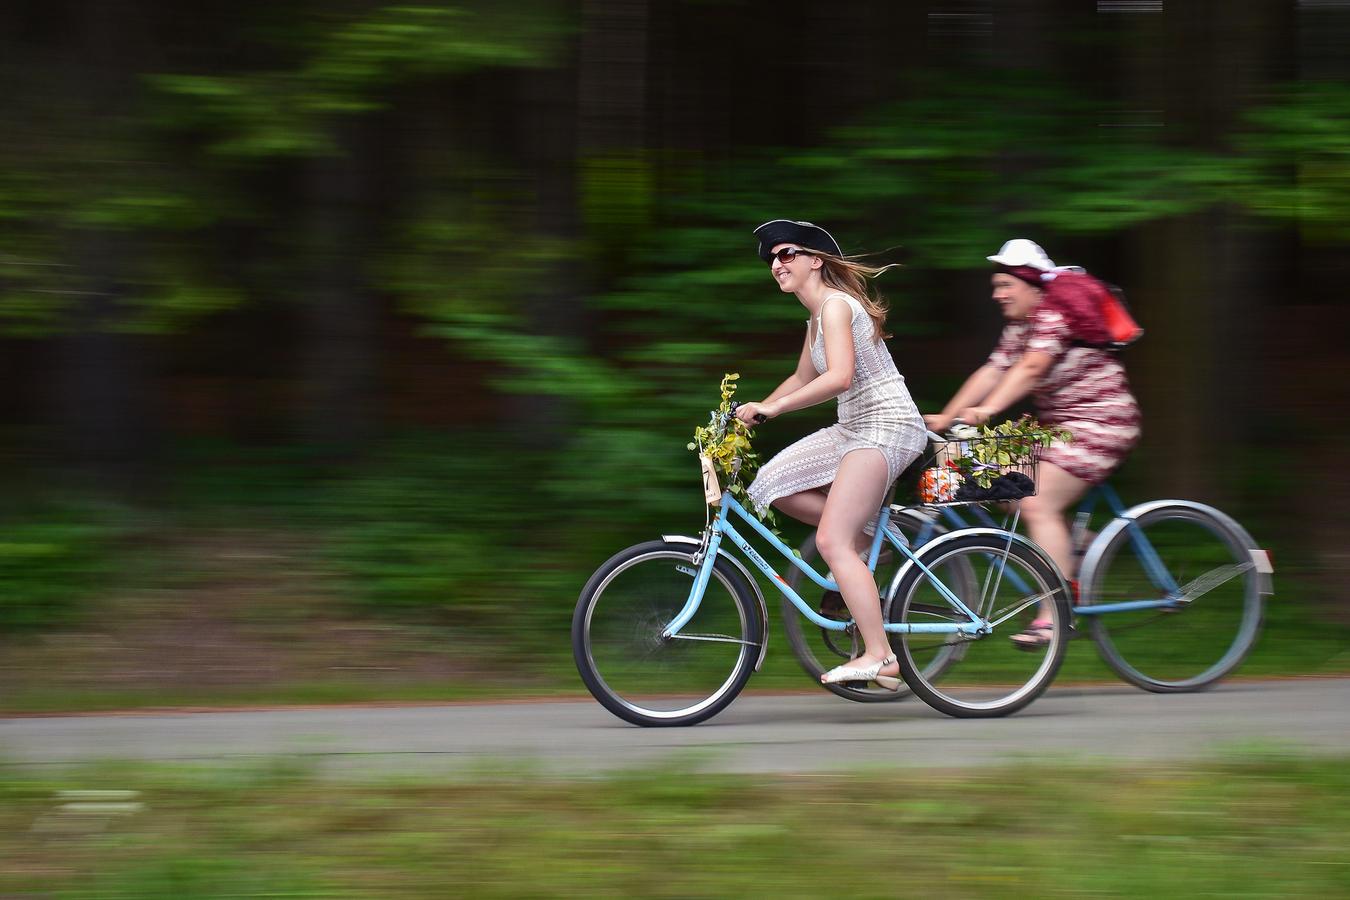 Zábava na kole ..